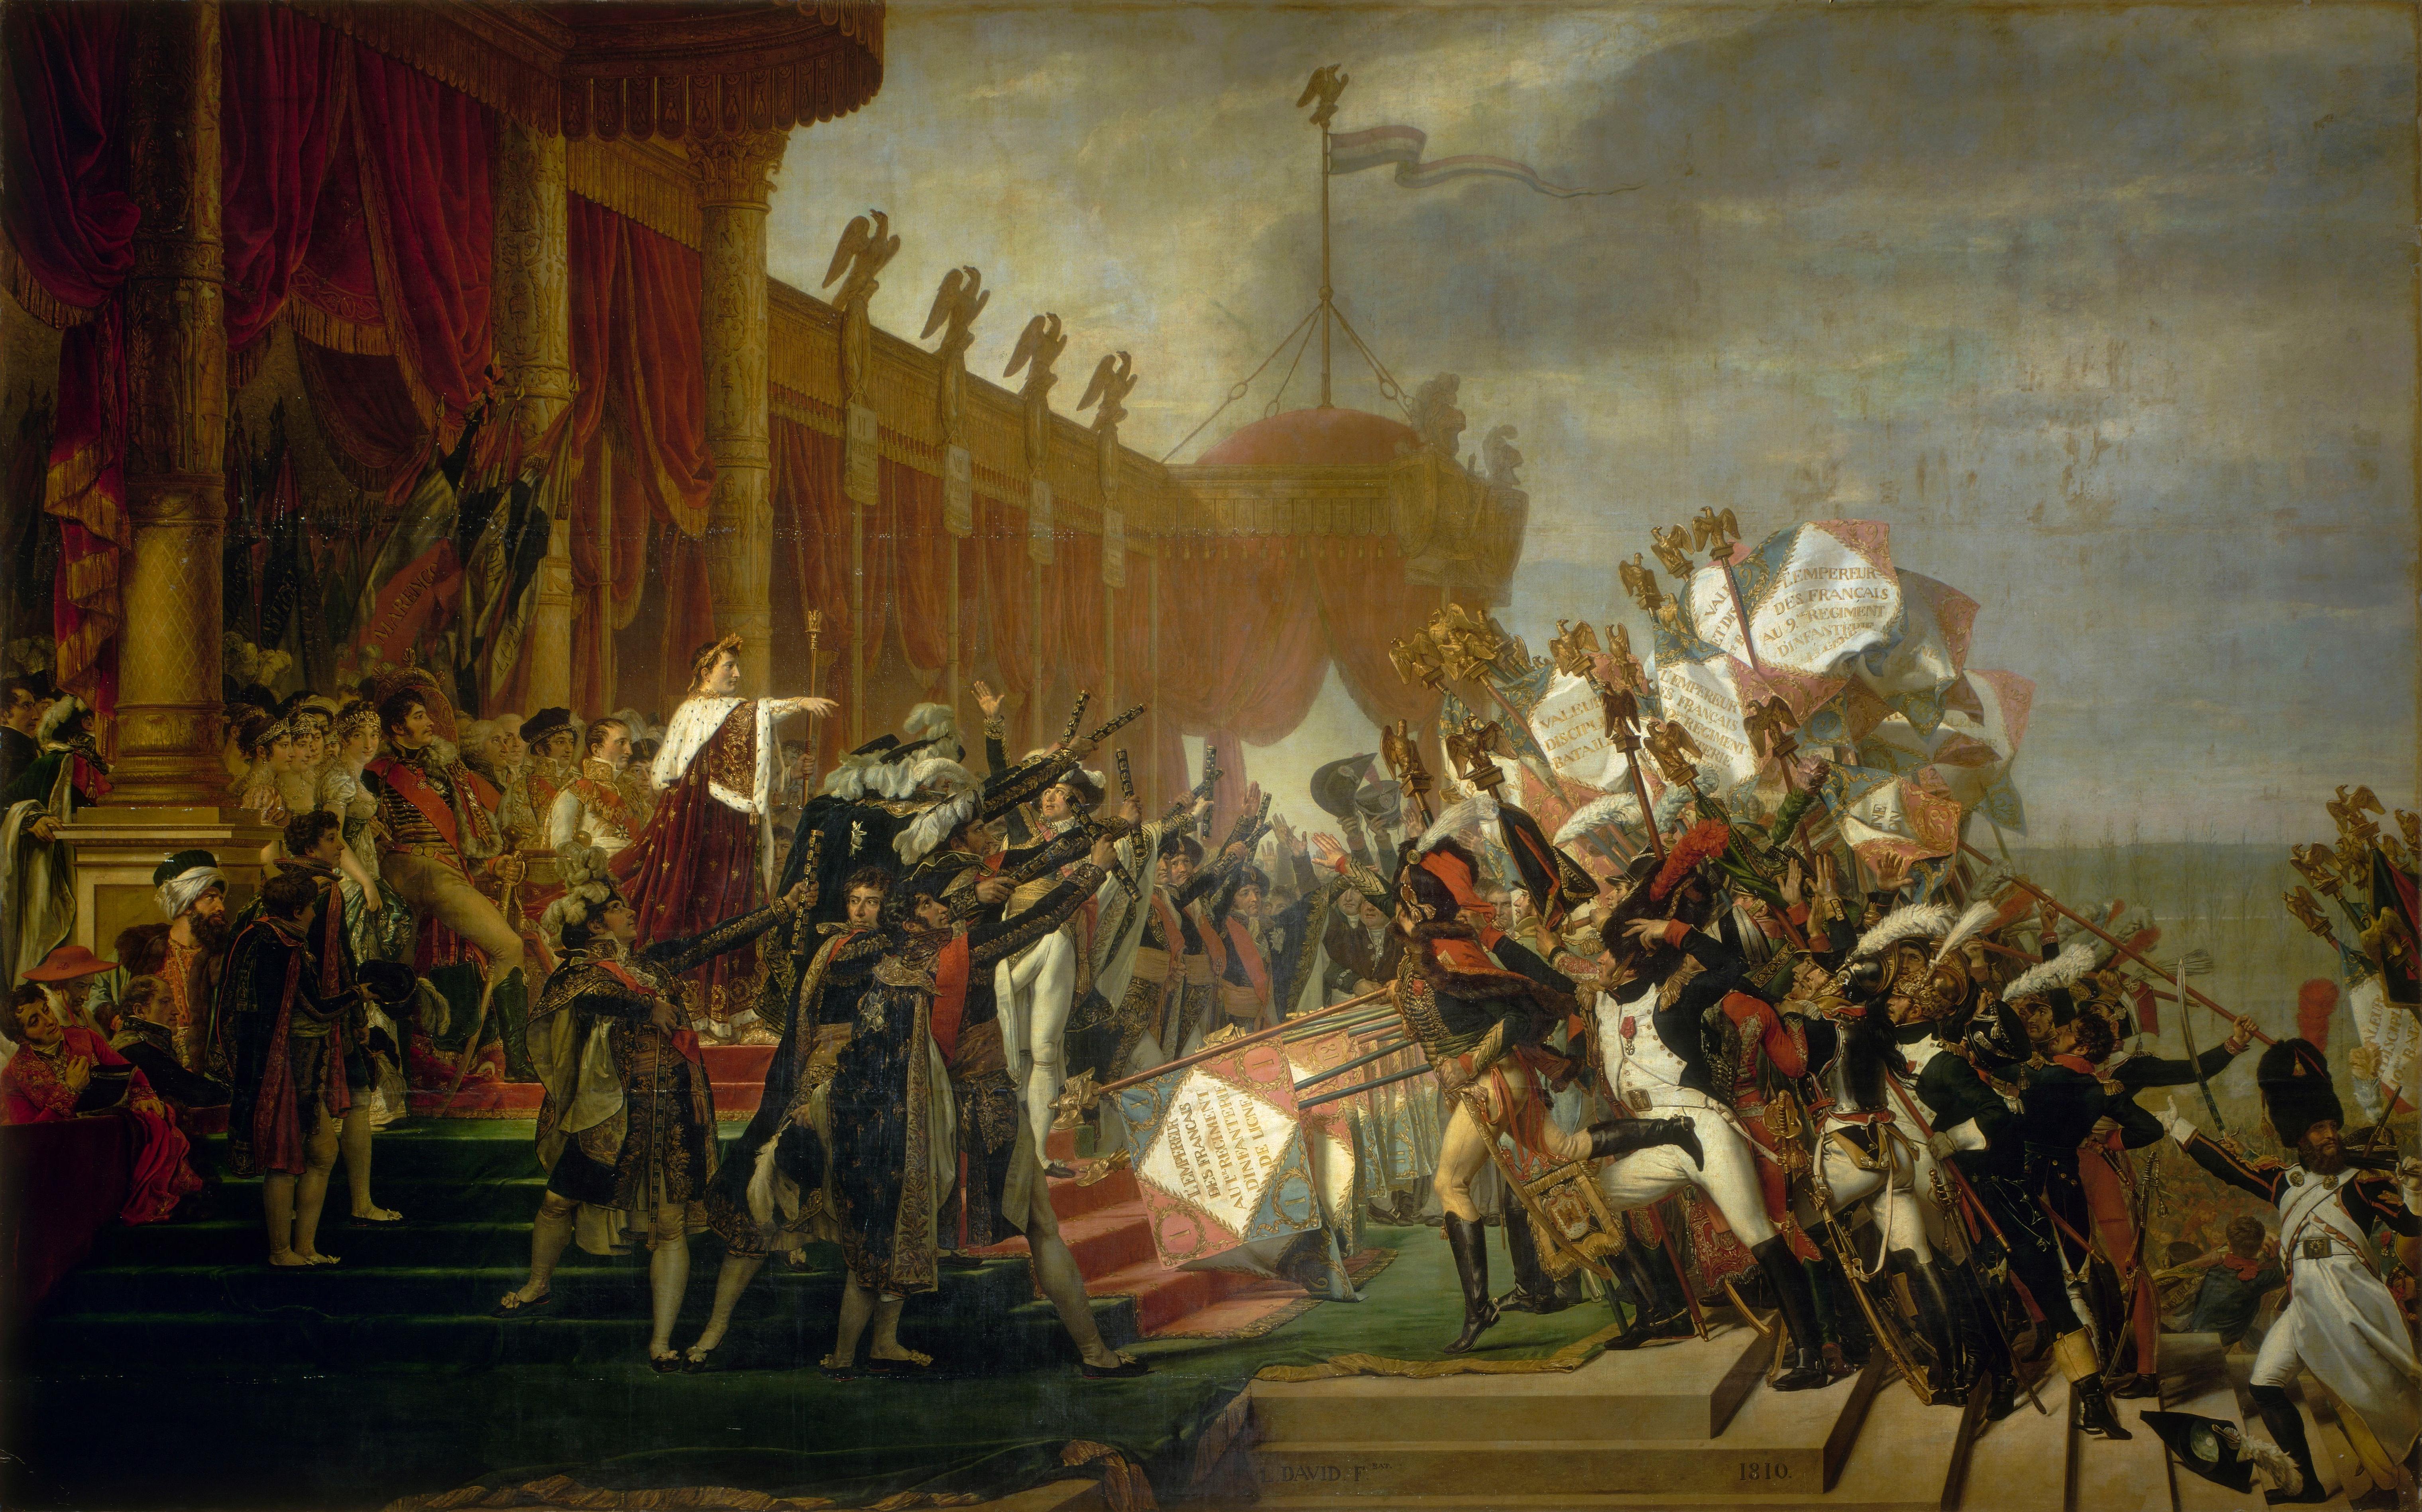 David 1810 Serment_de_l'armee_fait_a_l'Empereur_apres_la_distribution_des_aigles,_5_decembre_1804 Versailles